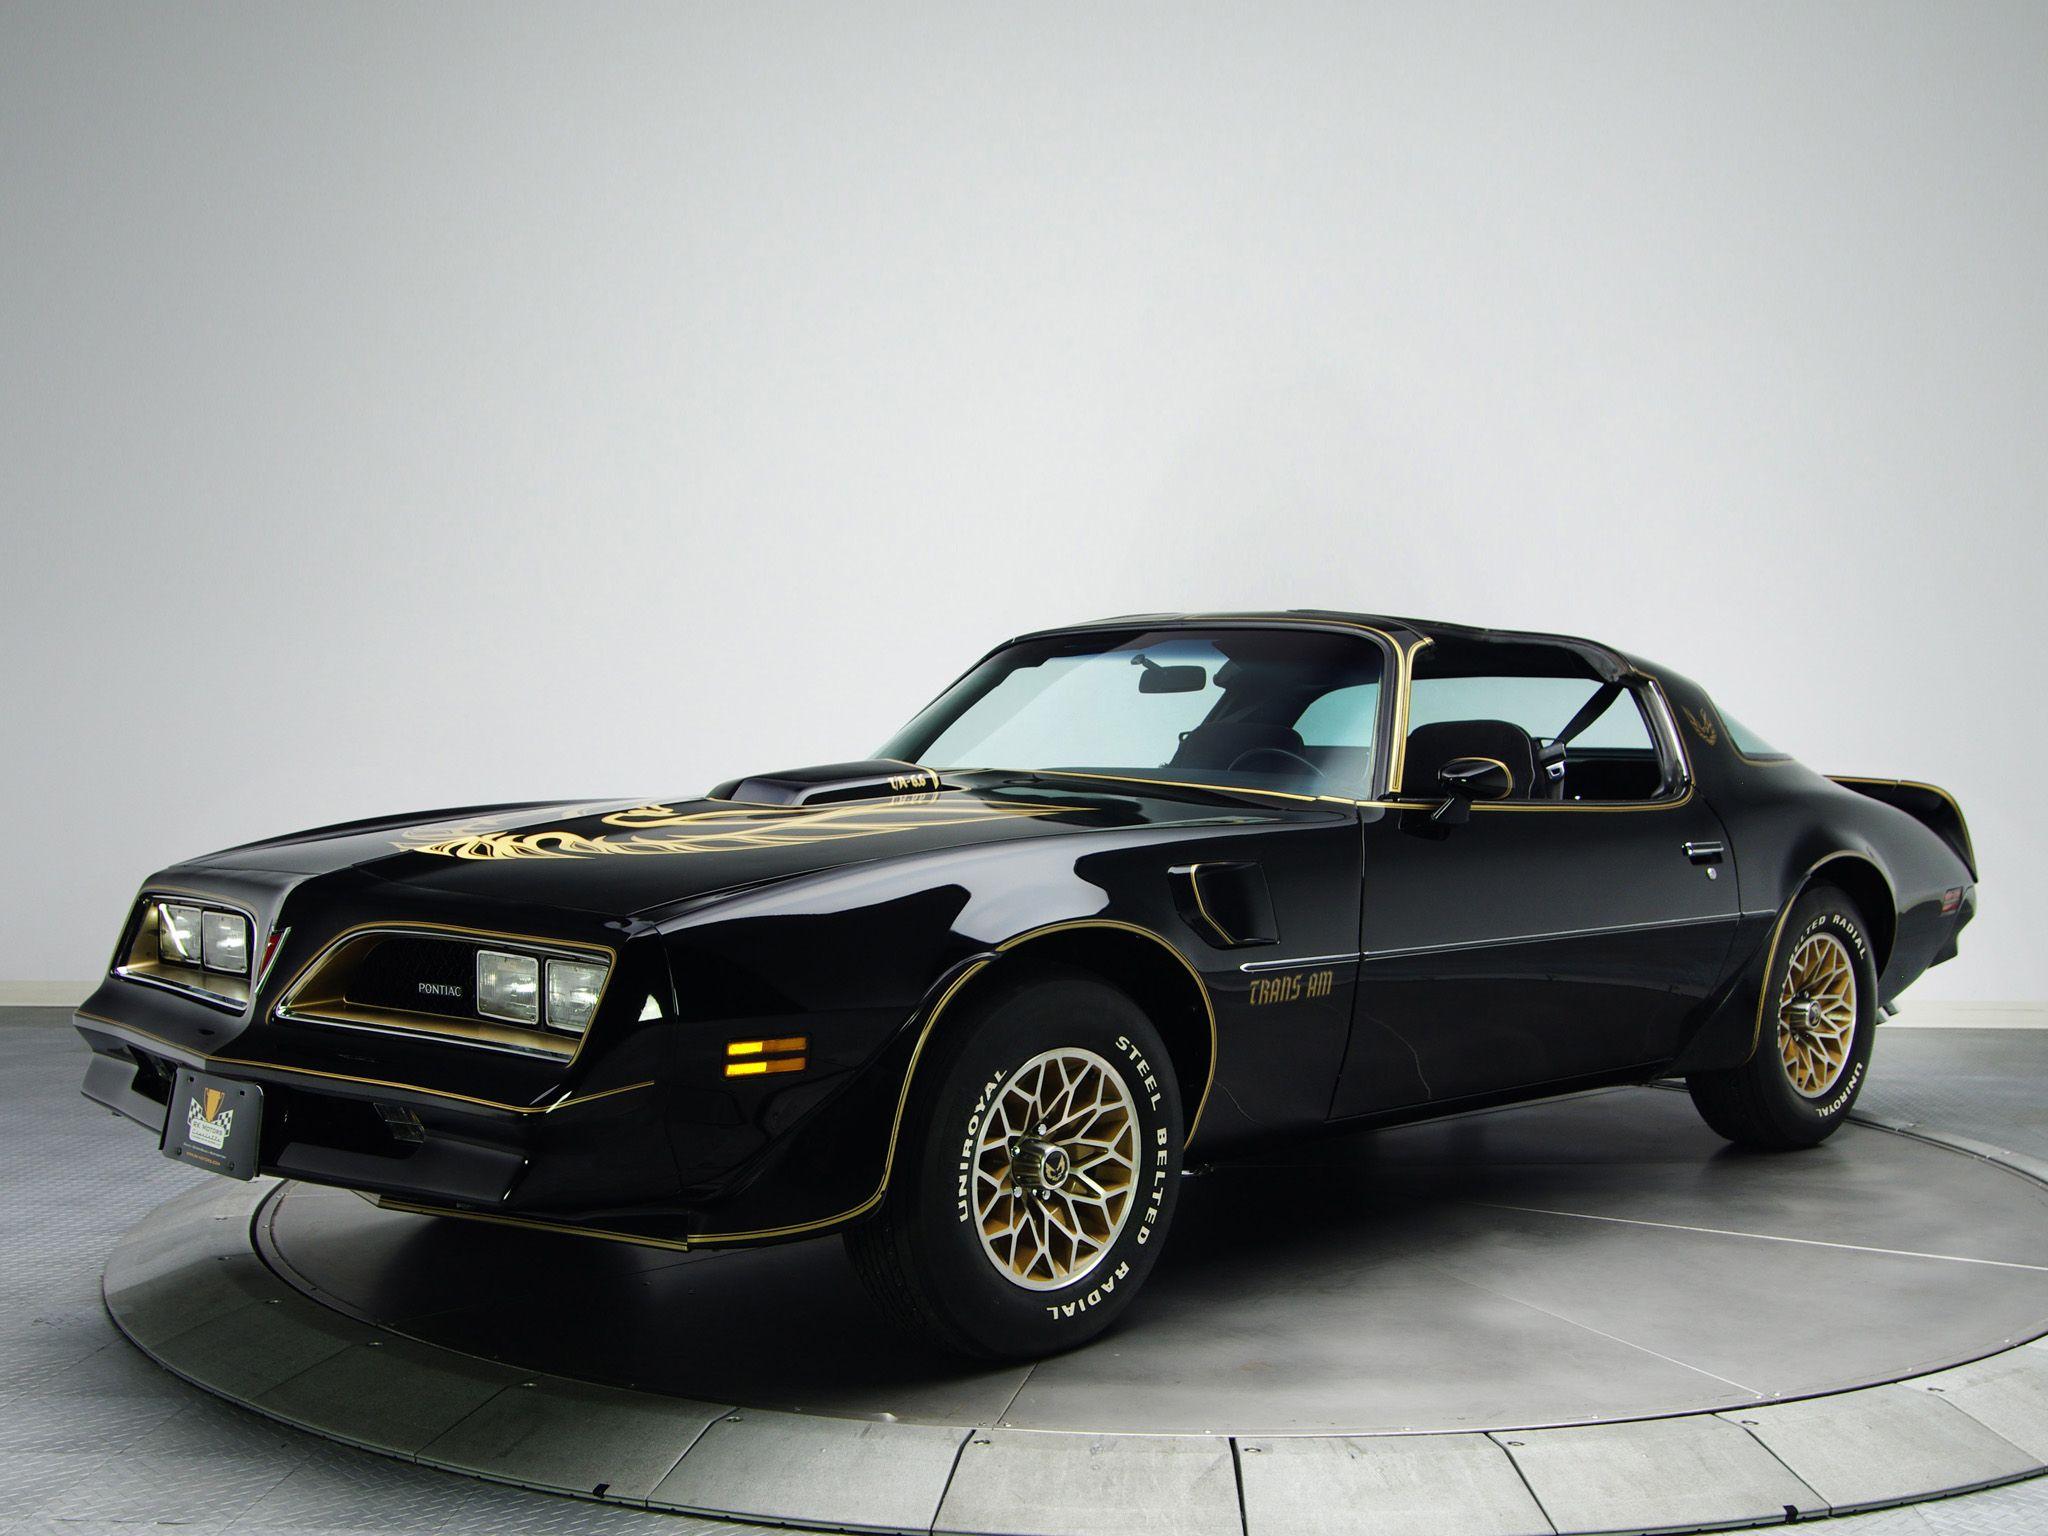 1978 special edition bandit trans am musclecars pinterest cars firebird and muscles